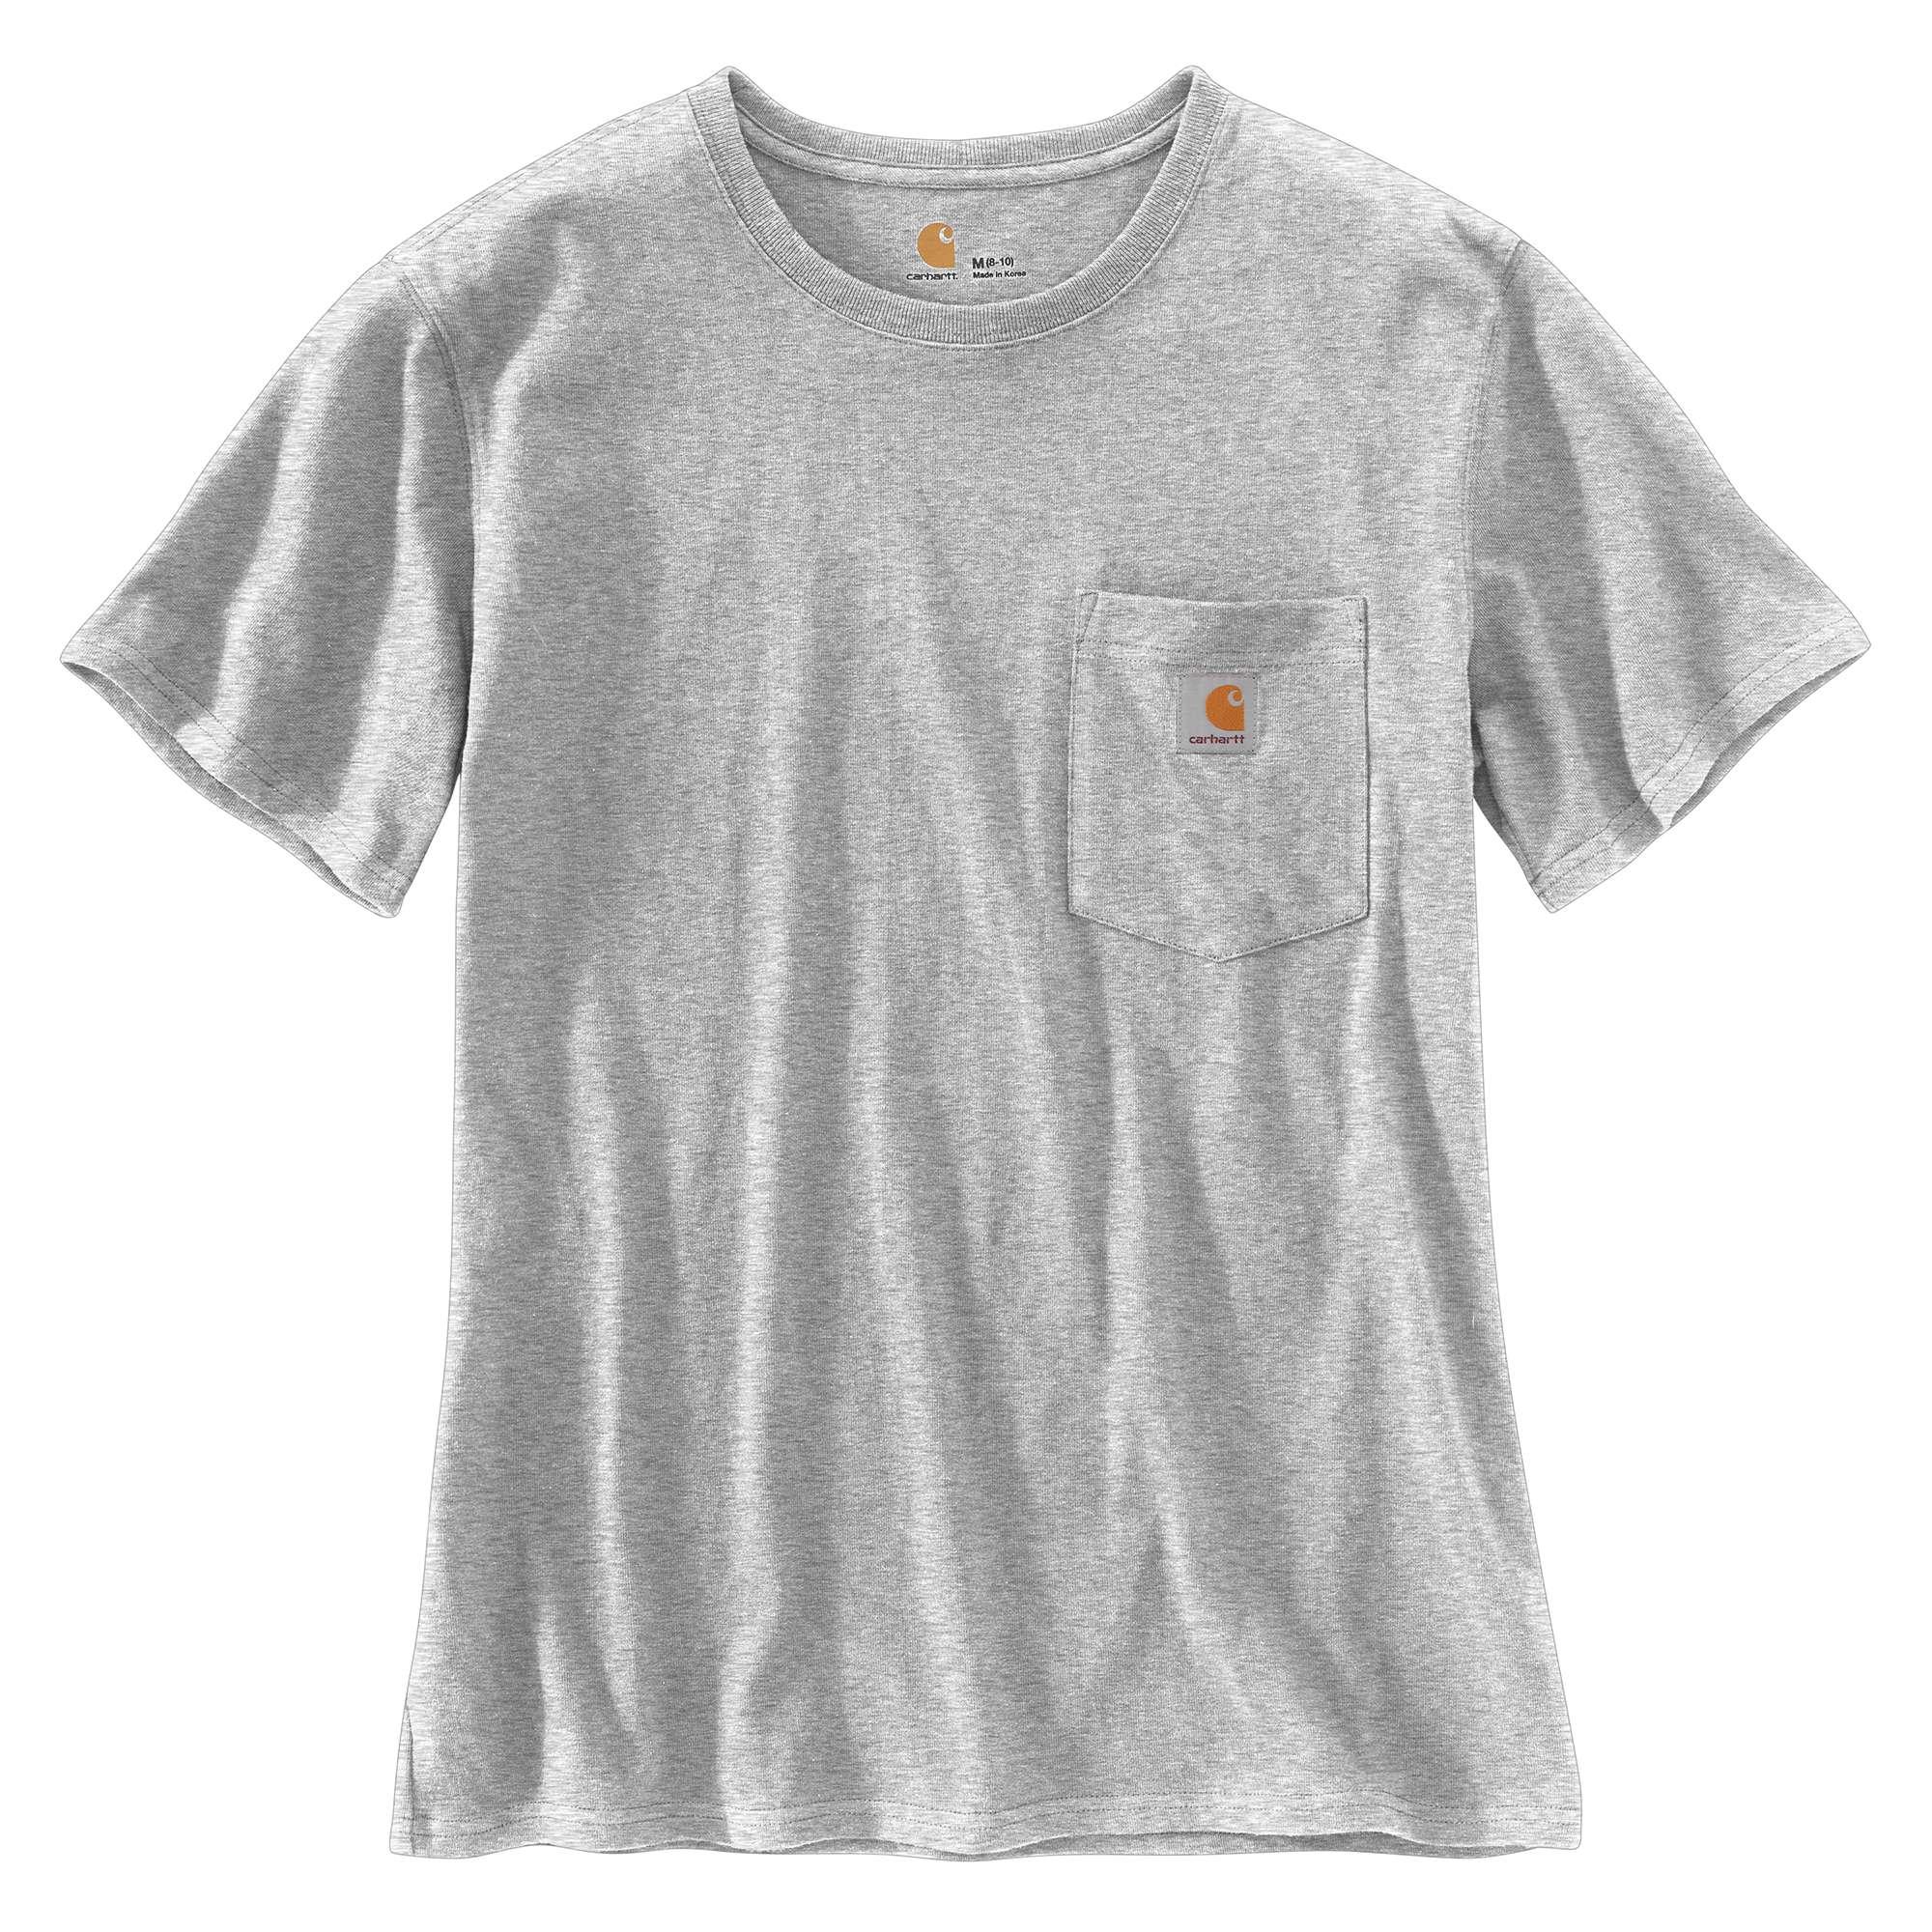 f690c551b9d Carhartt WK87 Workwear Pocket Short Sleeve T-shirt - Women s